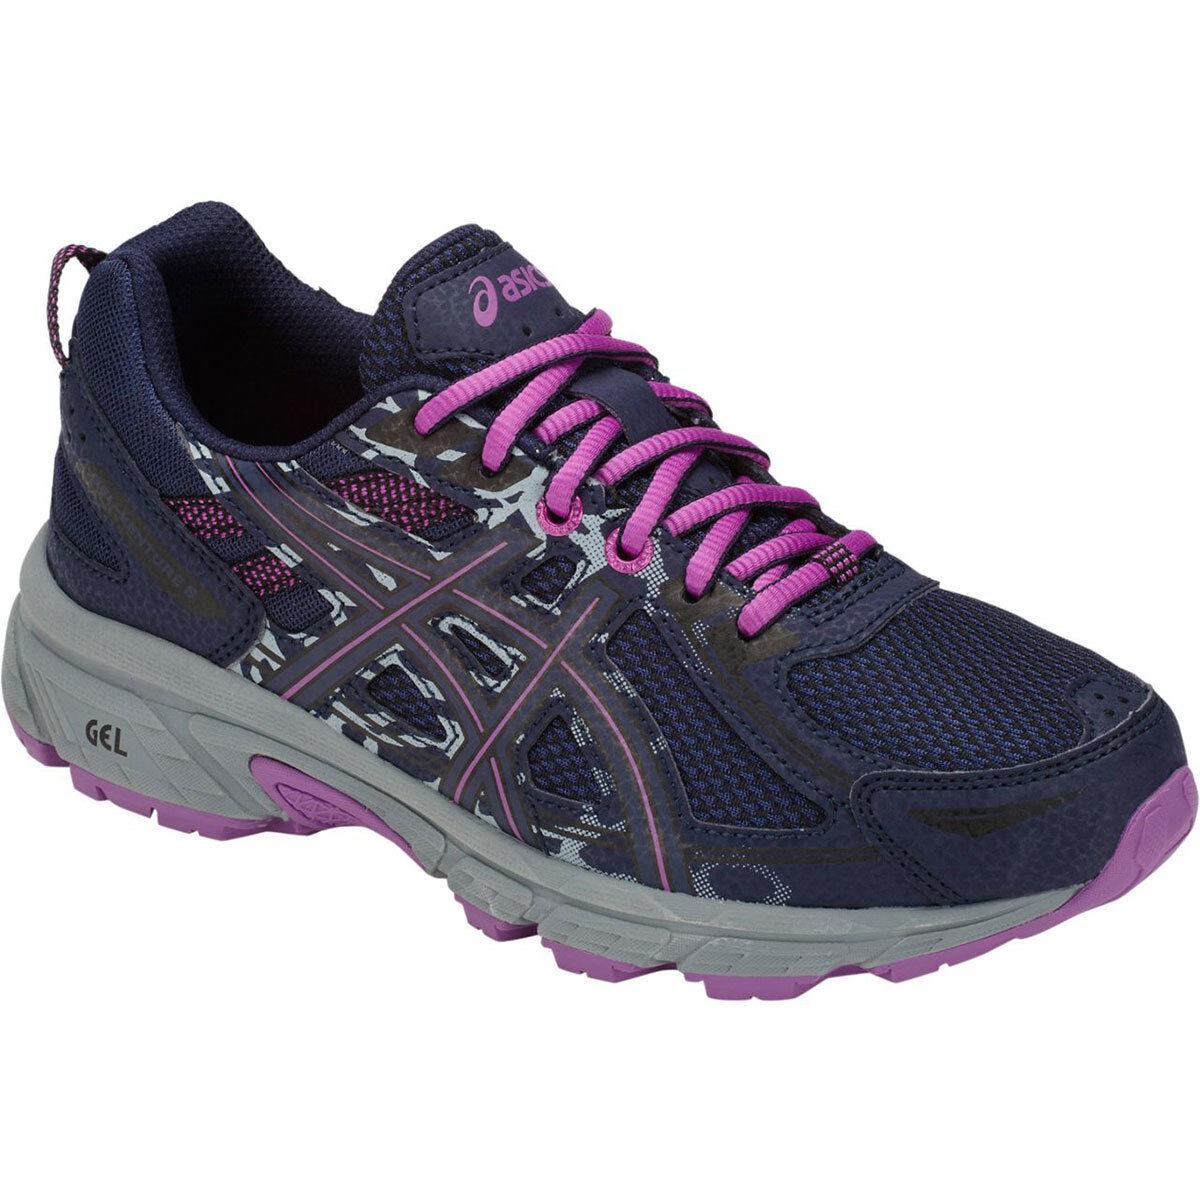 Asics Big Girls' Gel-Venture 6 Gs Running Shoes